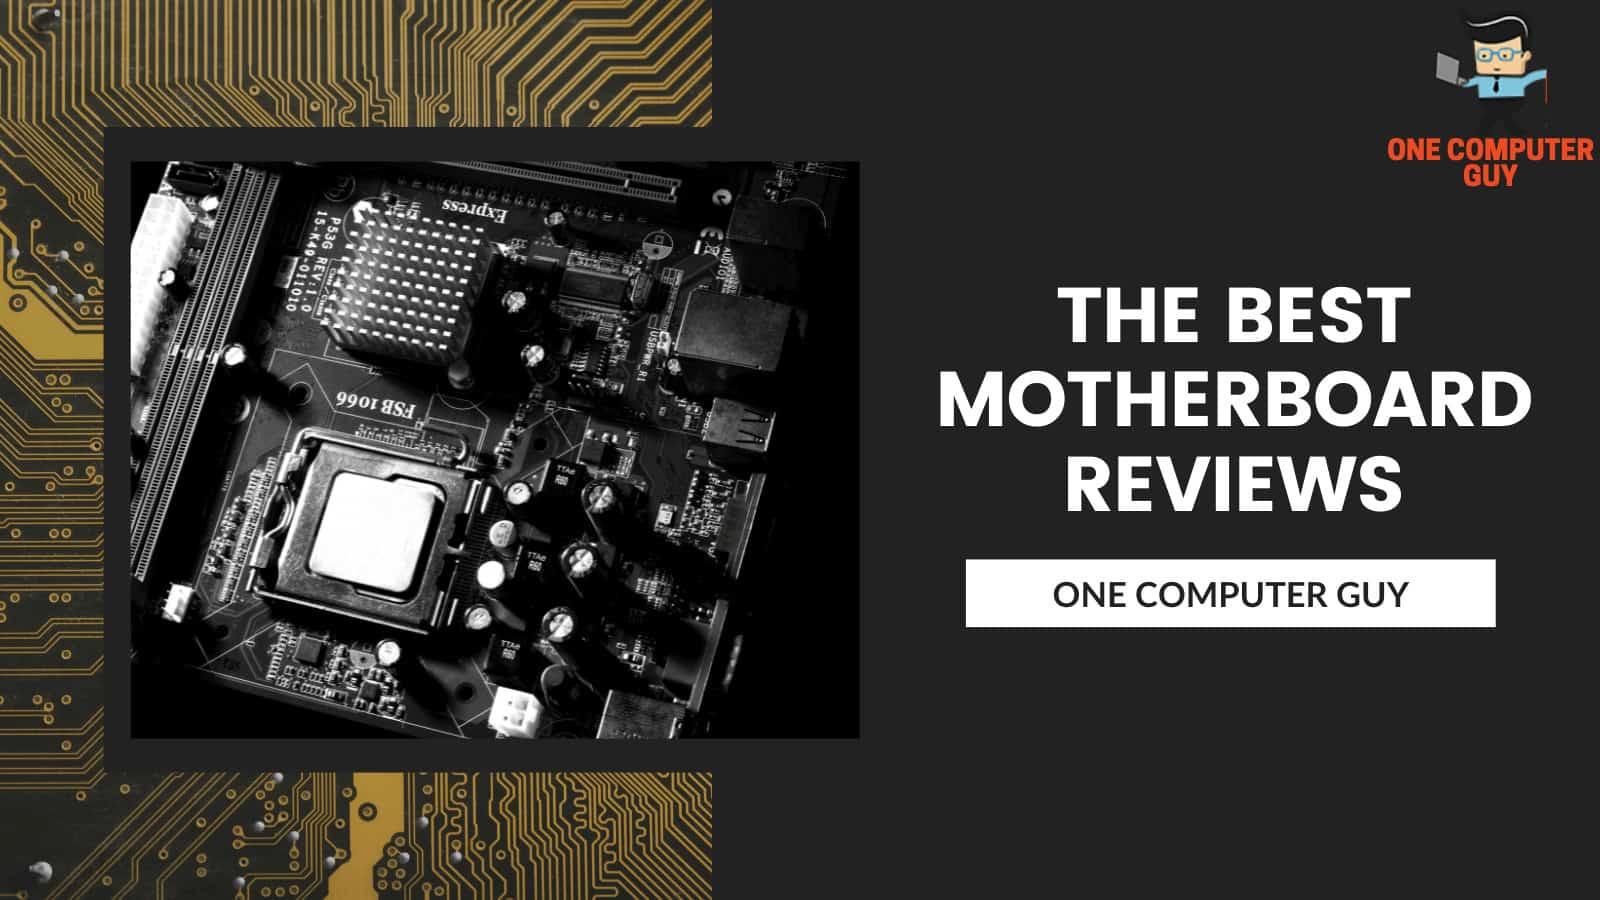 Motherboard Reviews